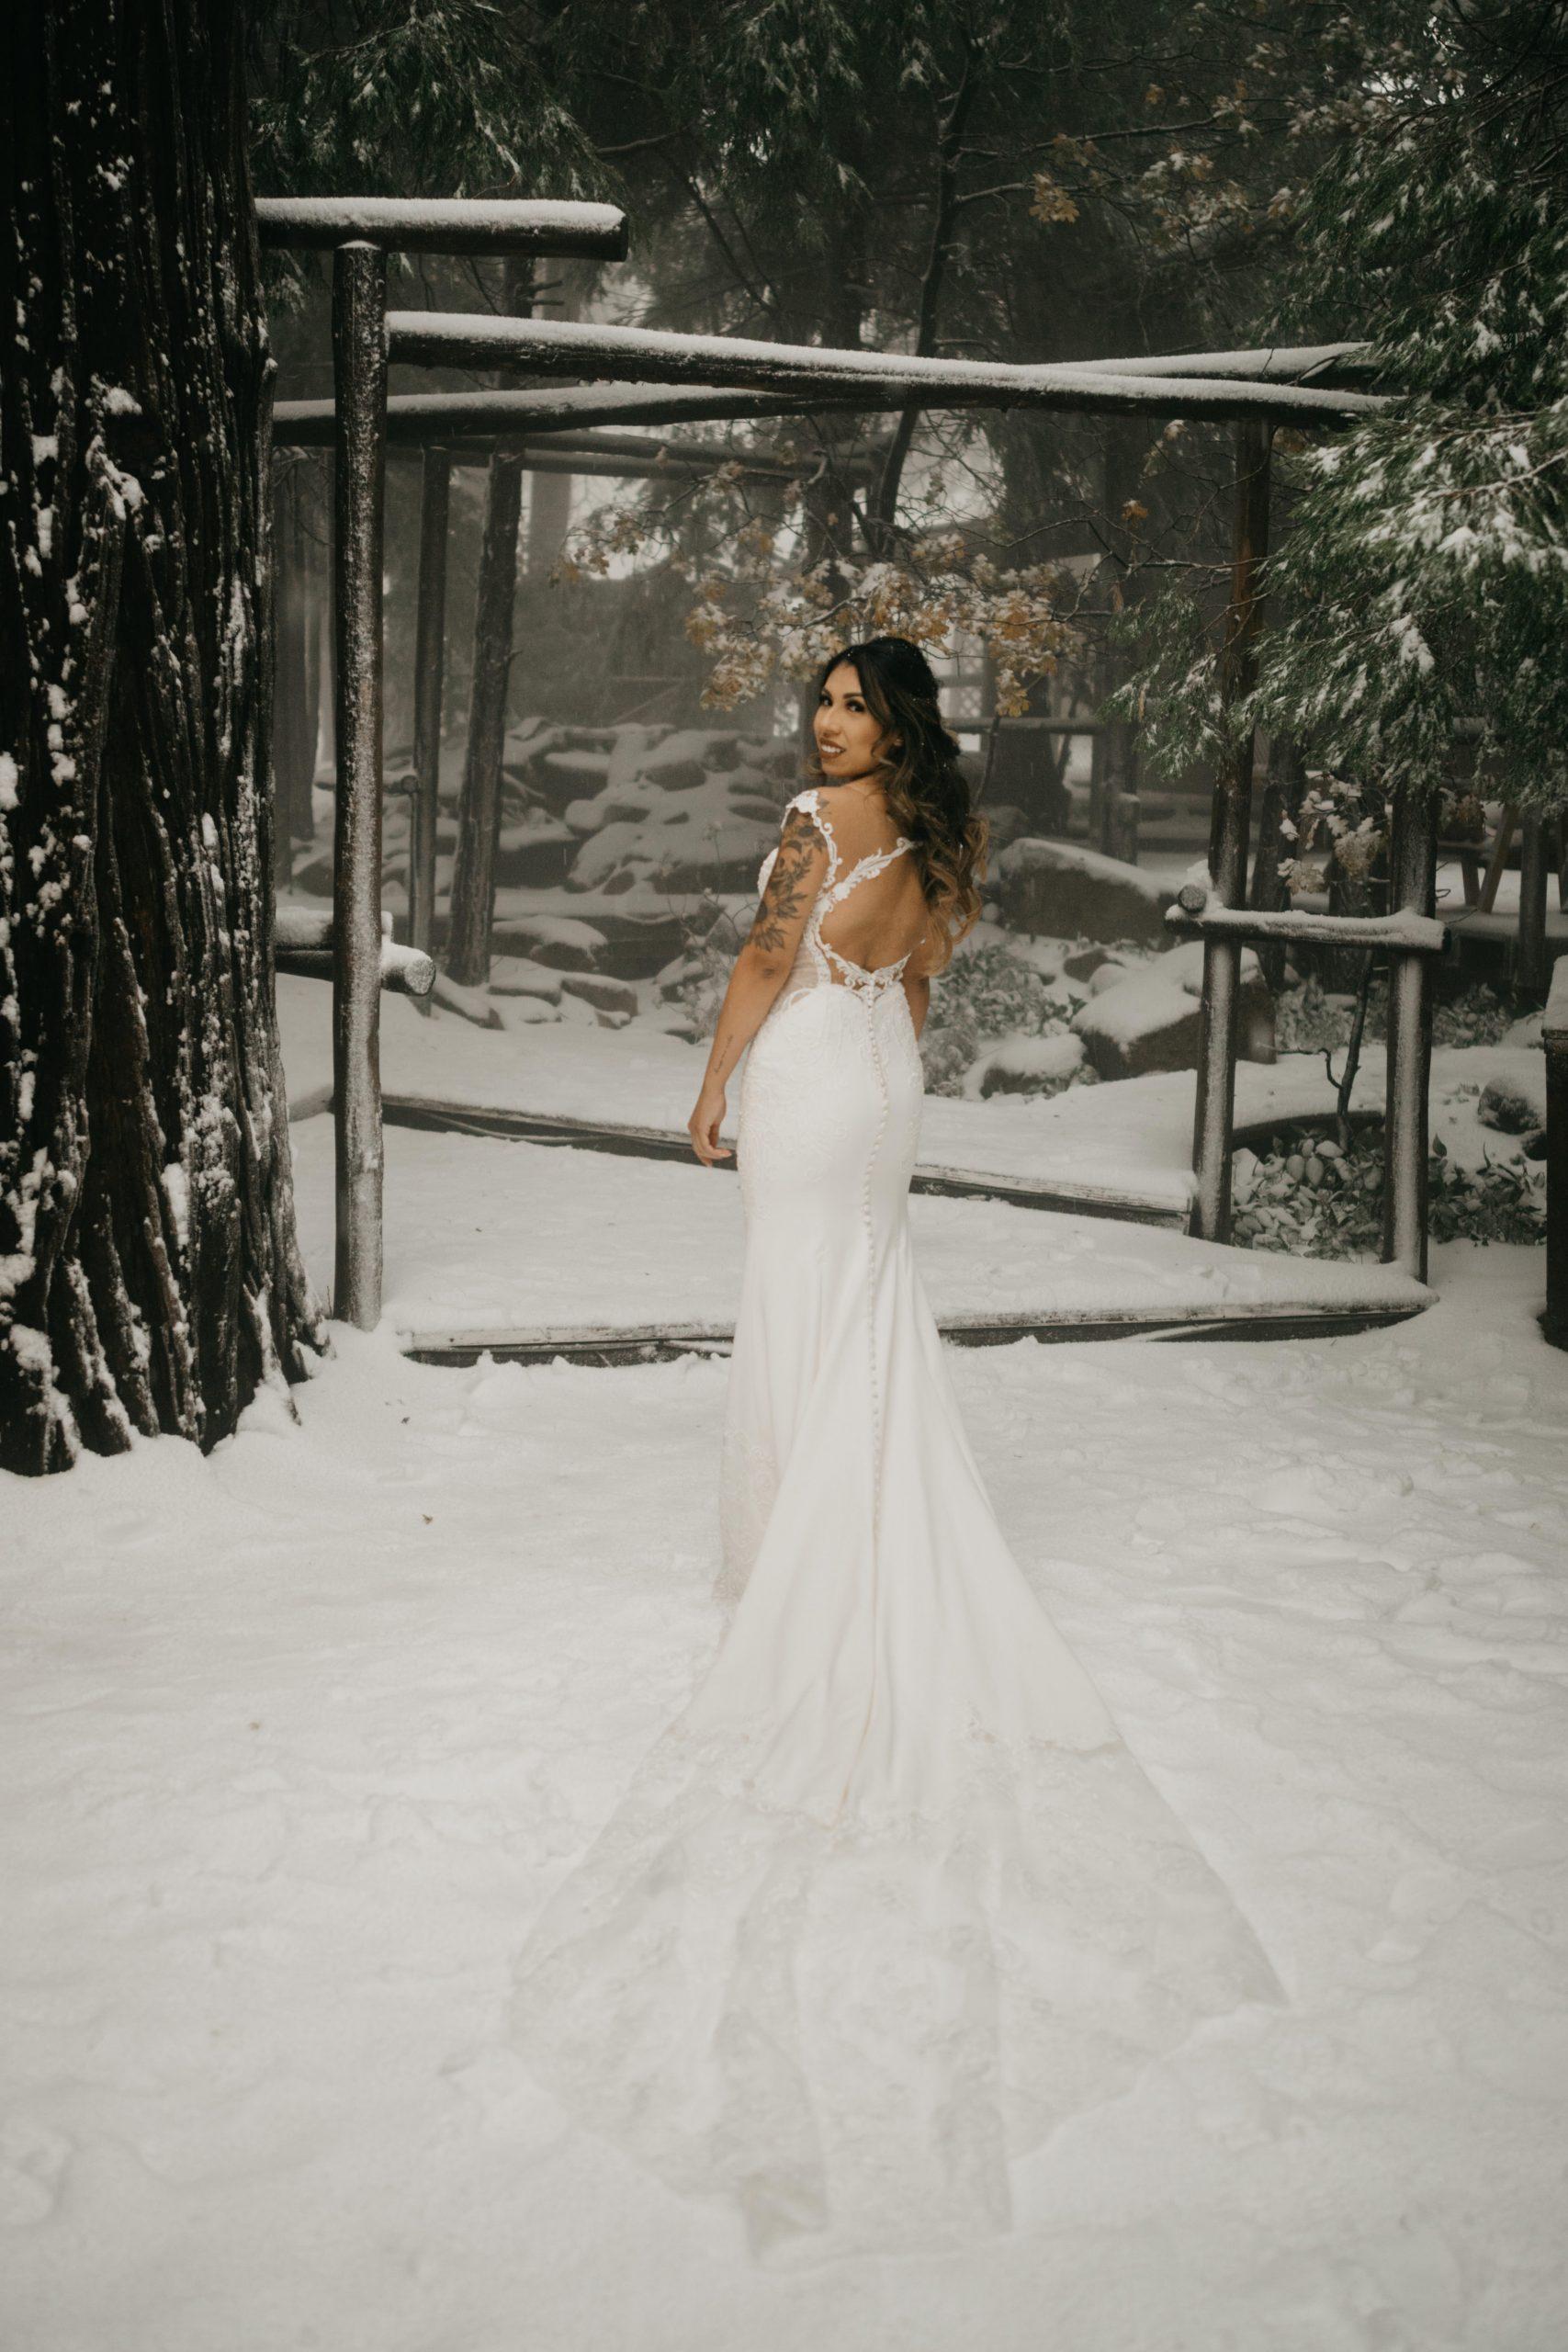 Bride portrait in the winter in Arrowhead Pine Rose Wedding, image by Fatima Elreda Photo